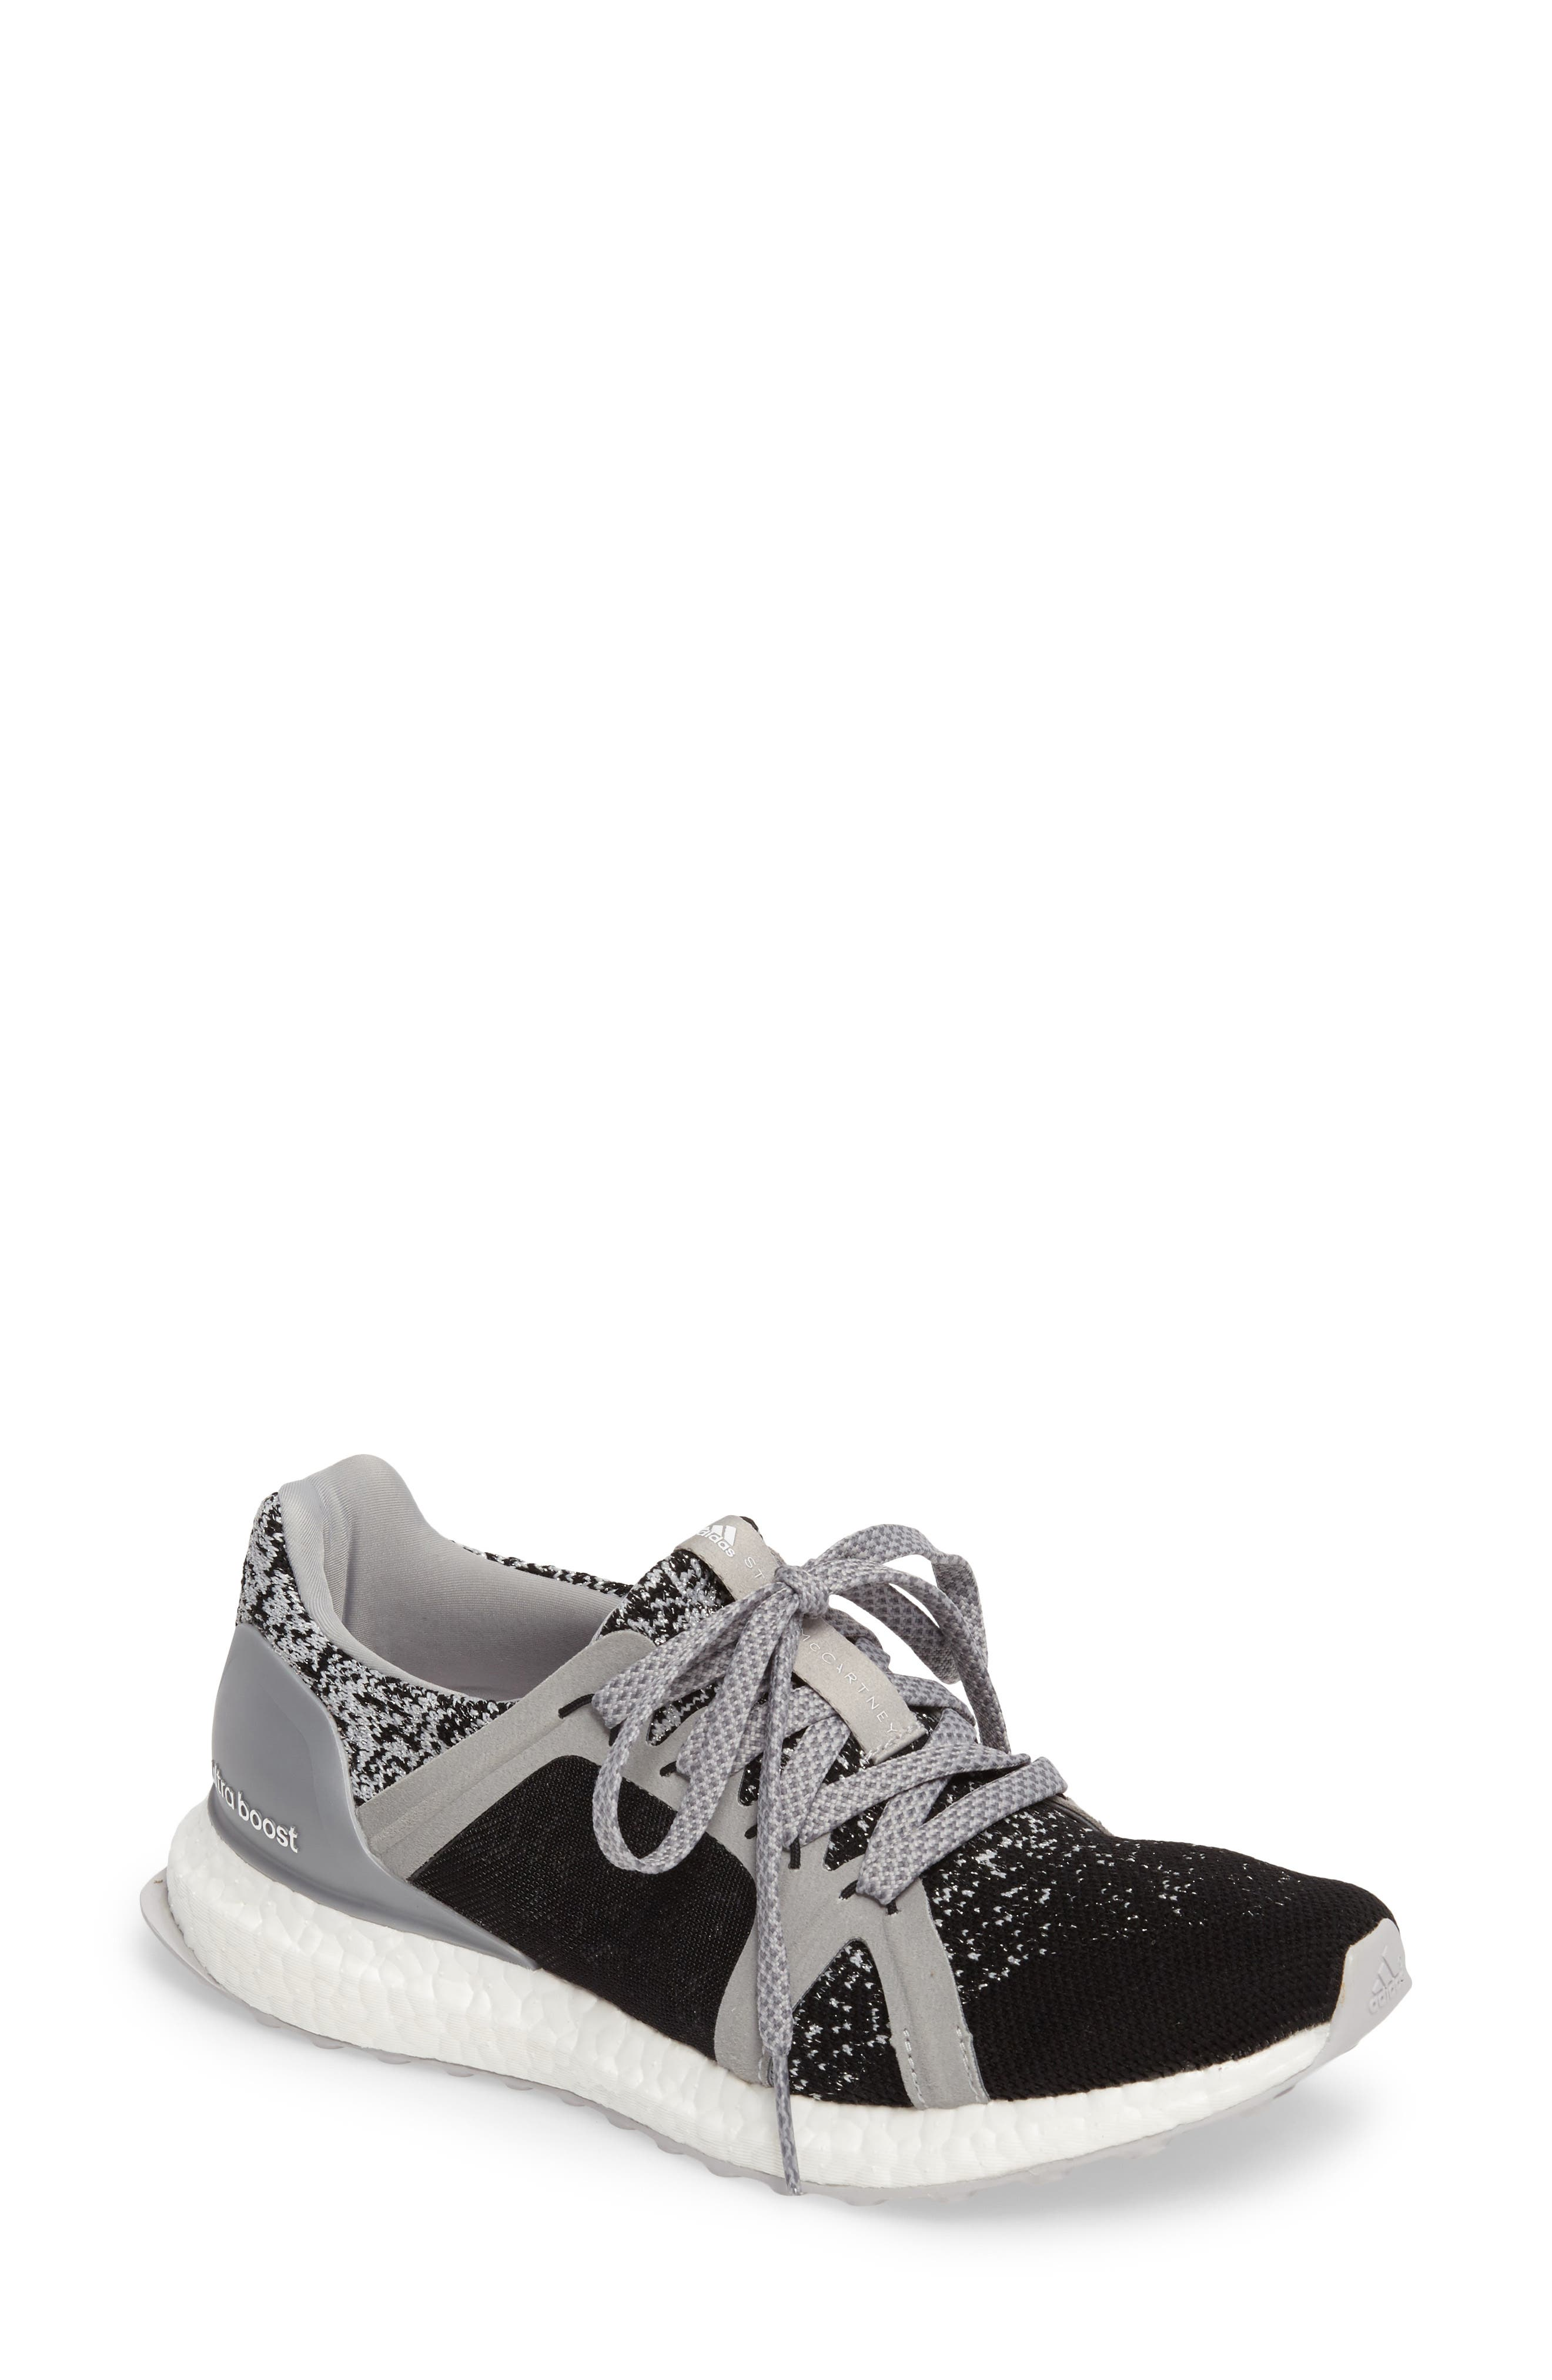 adidas \u0027UltraBoost\u0027 Running Shoe (Women)